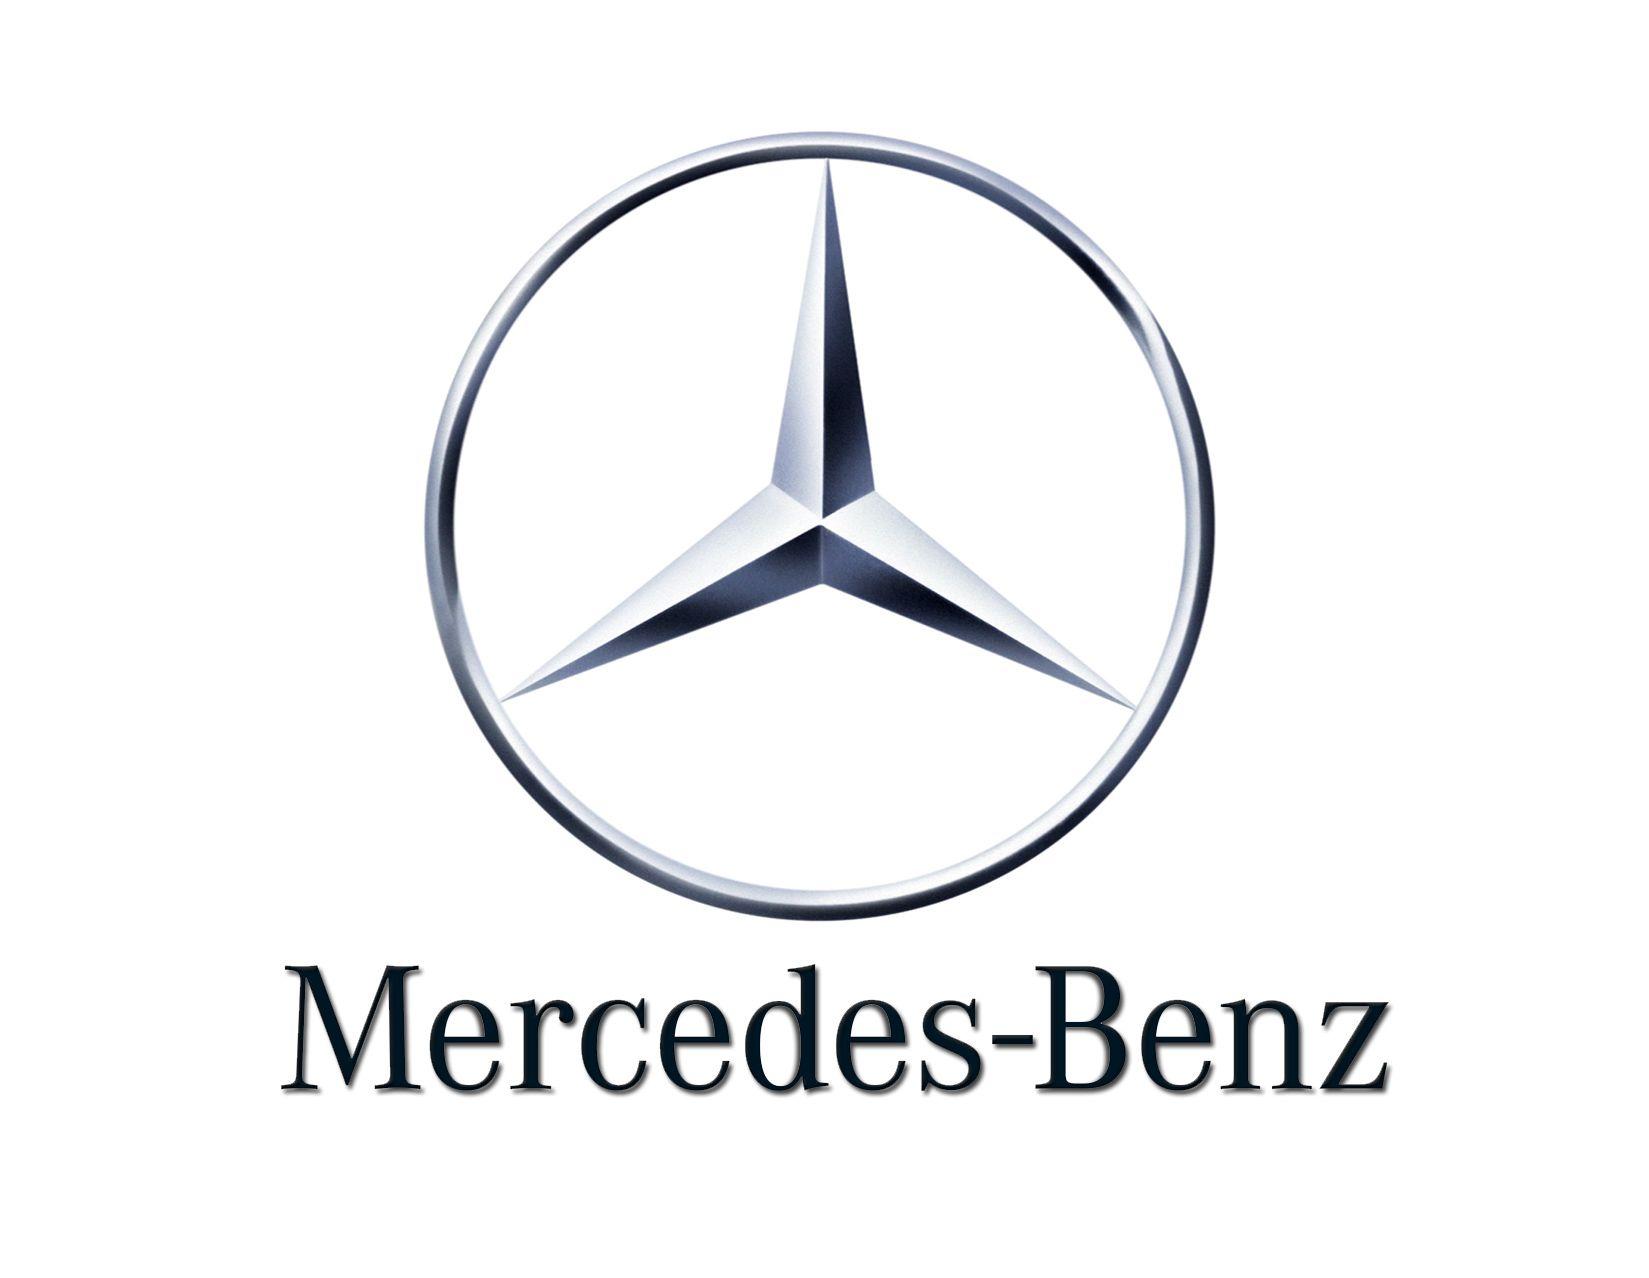 Mercedes benz logo worlds most famous automotive brand bobo mercedes benz logo worlds most famous automotive brand bobo pixy gallery biocorpaavc